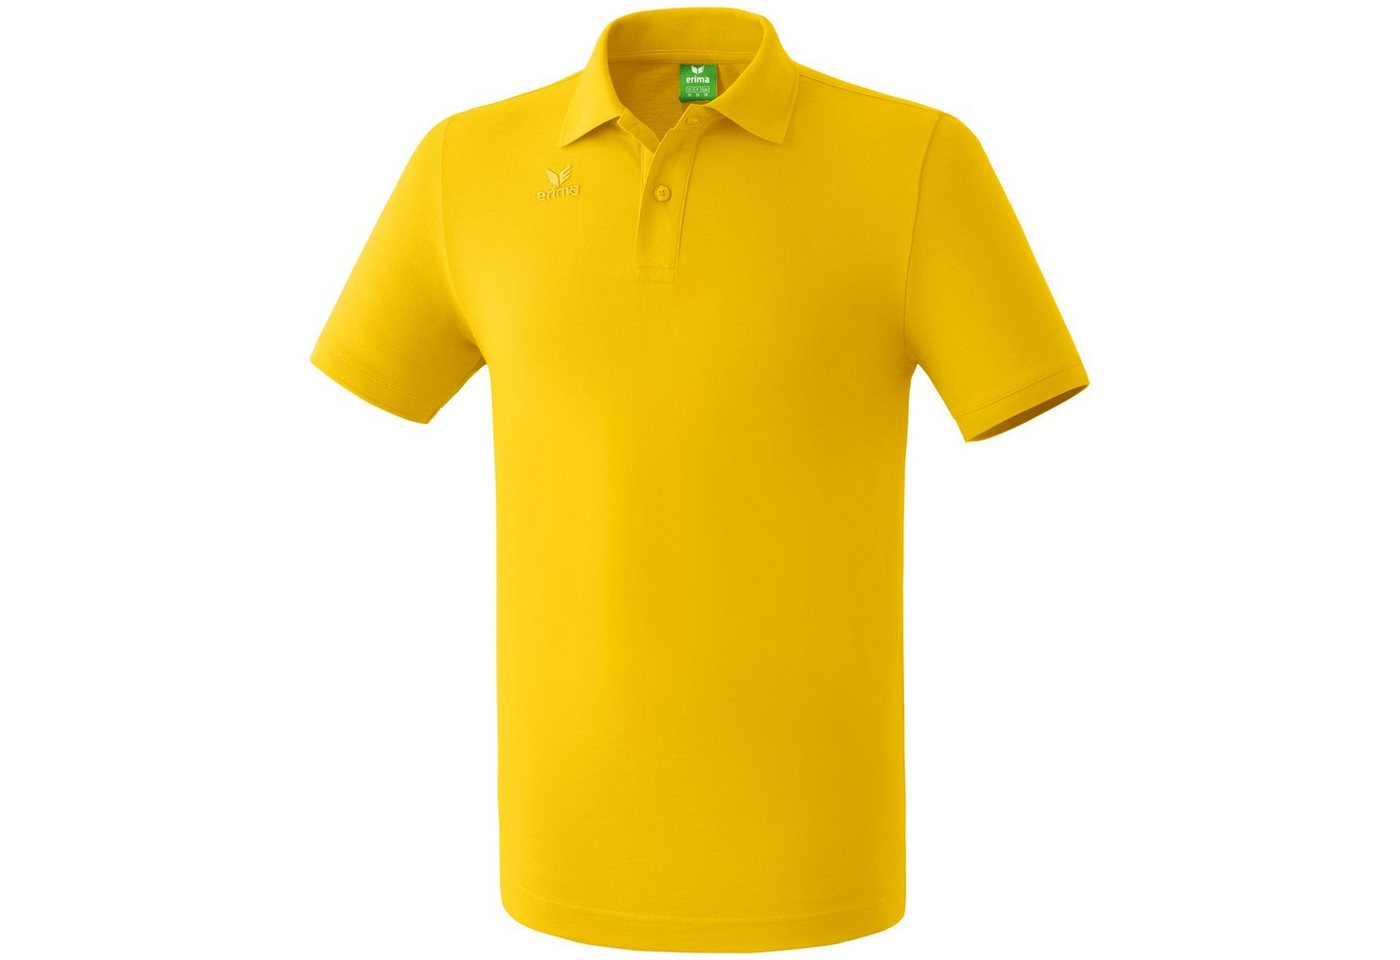 Erima Teamsport Poloshirt Herren | Sportbekleidung > Sportshirts > Poloshirts | Gelb | Erima